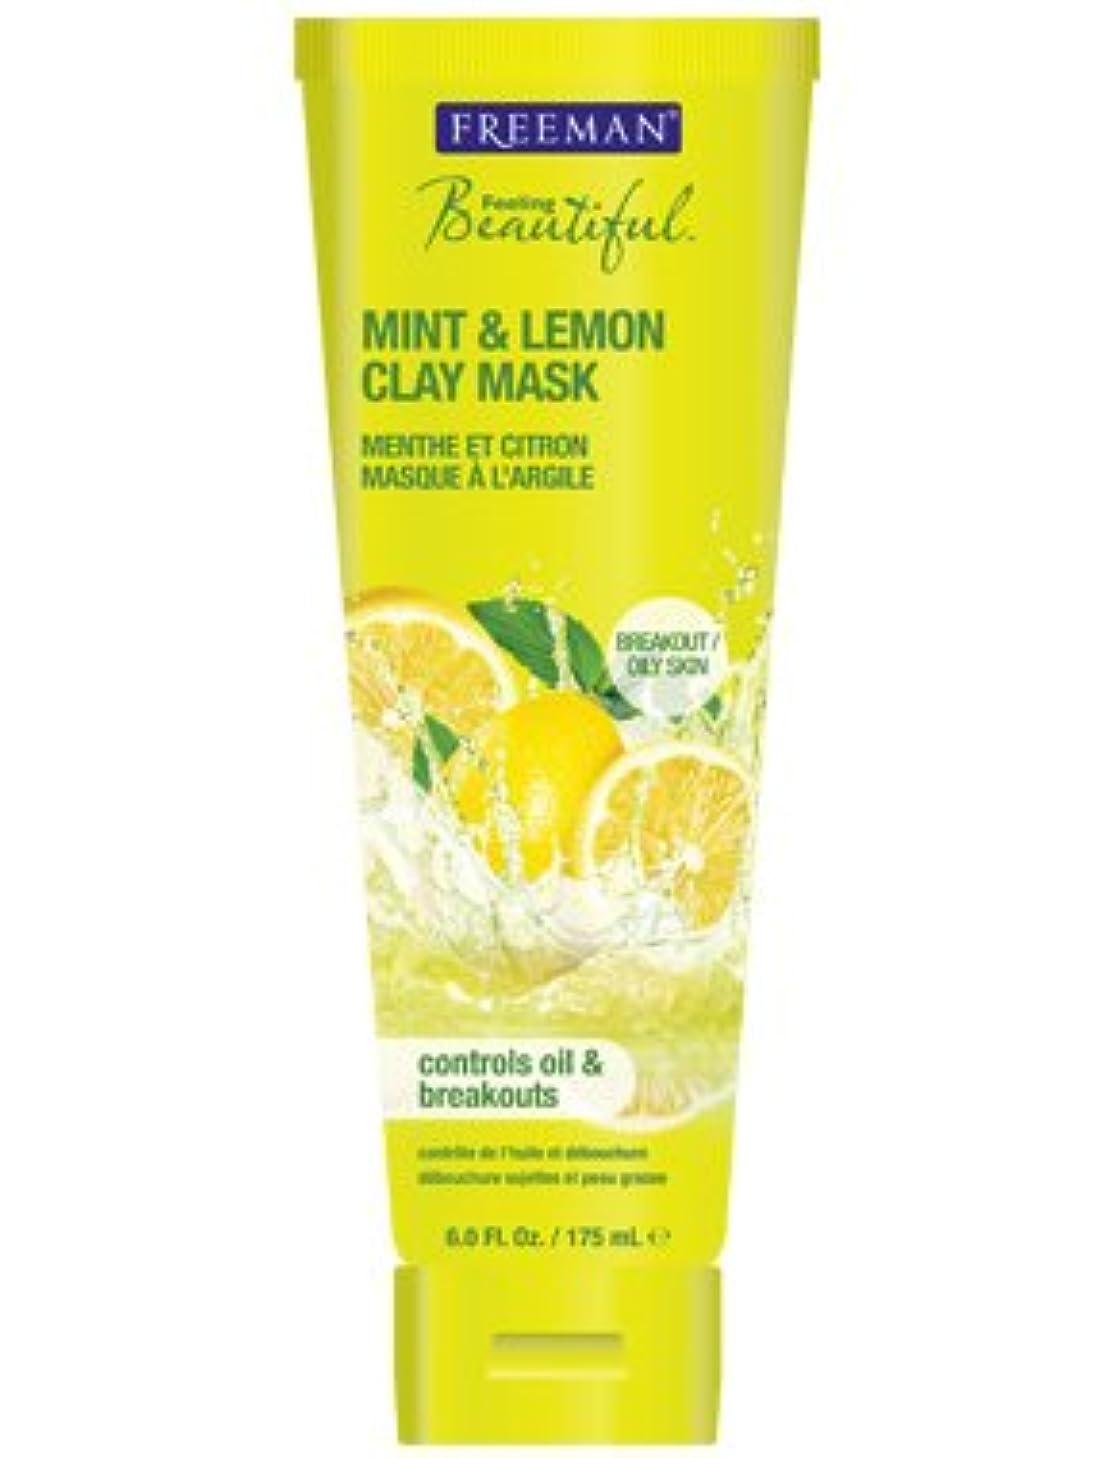 Freeman Feeling Beautiful Facial Clay Mask, Mint and Lemon - 6 Oz(175 ml), Pack of 2